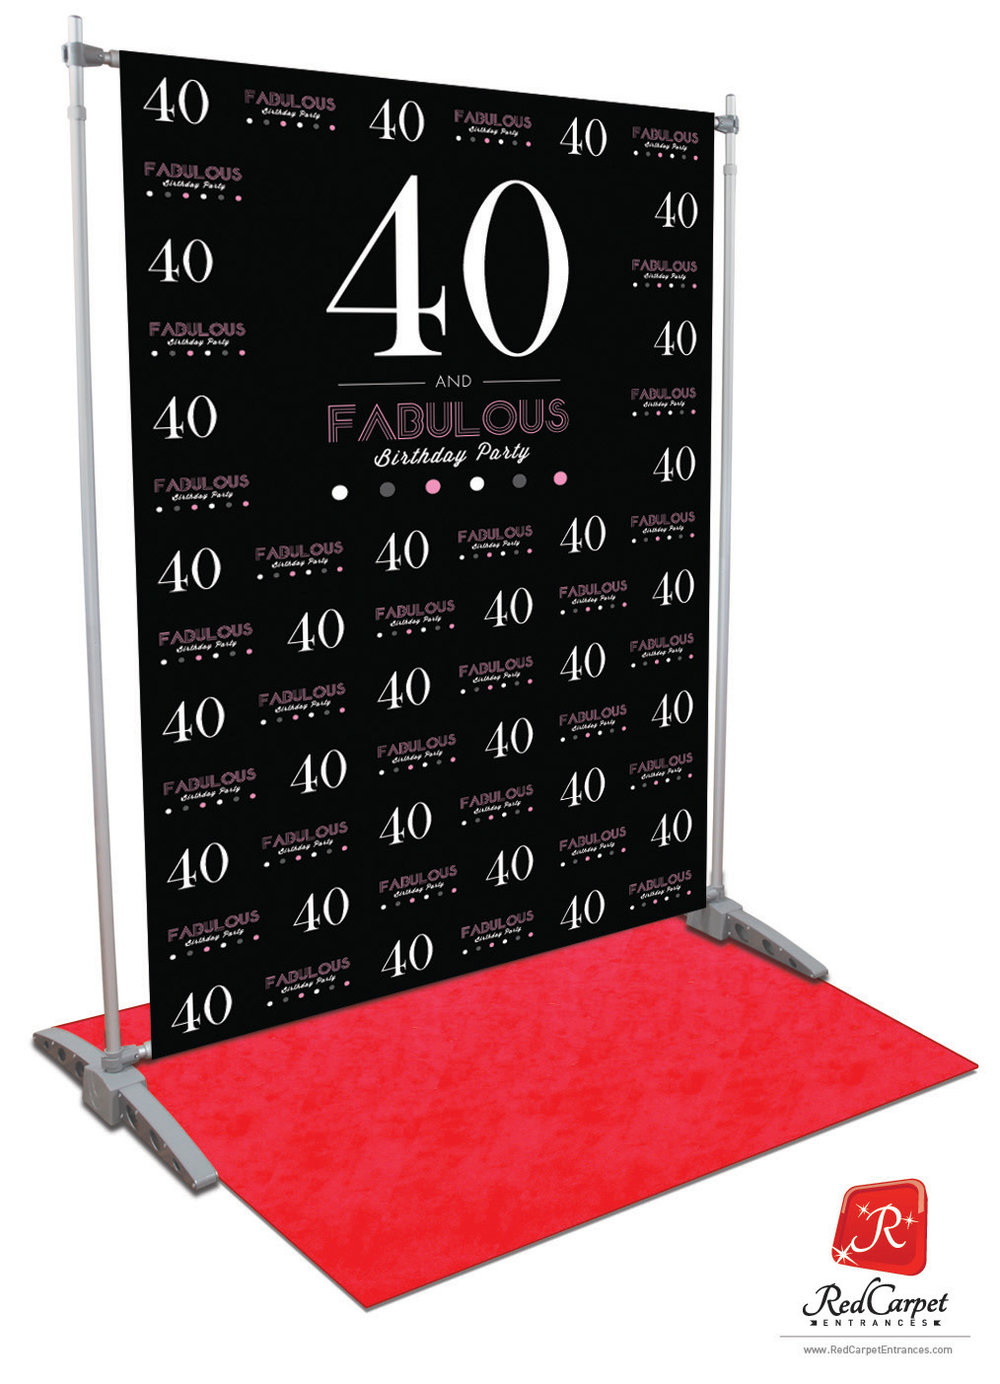 40 And Fabulous Birthday Backdrop Red Carpet Kit Black